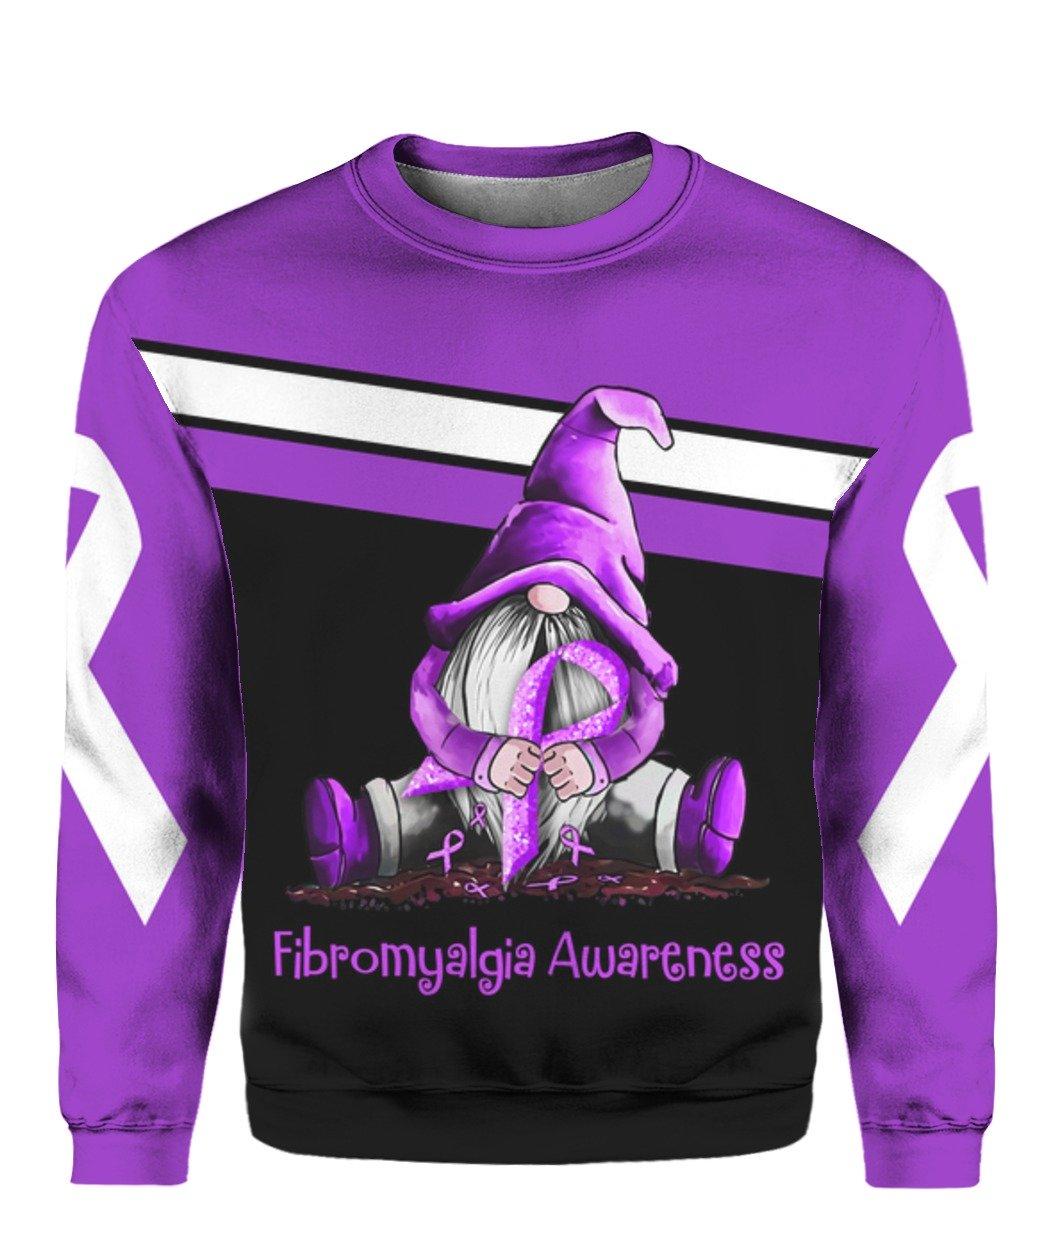 Gnome fibromyalgia awareness full printing sweatshirt